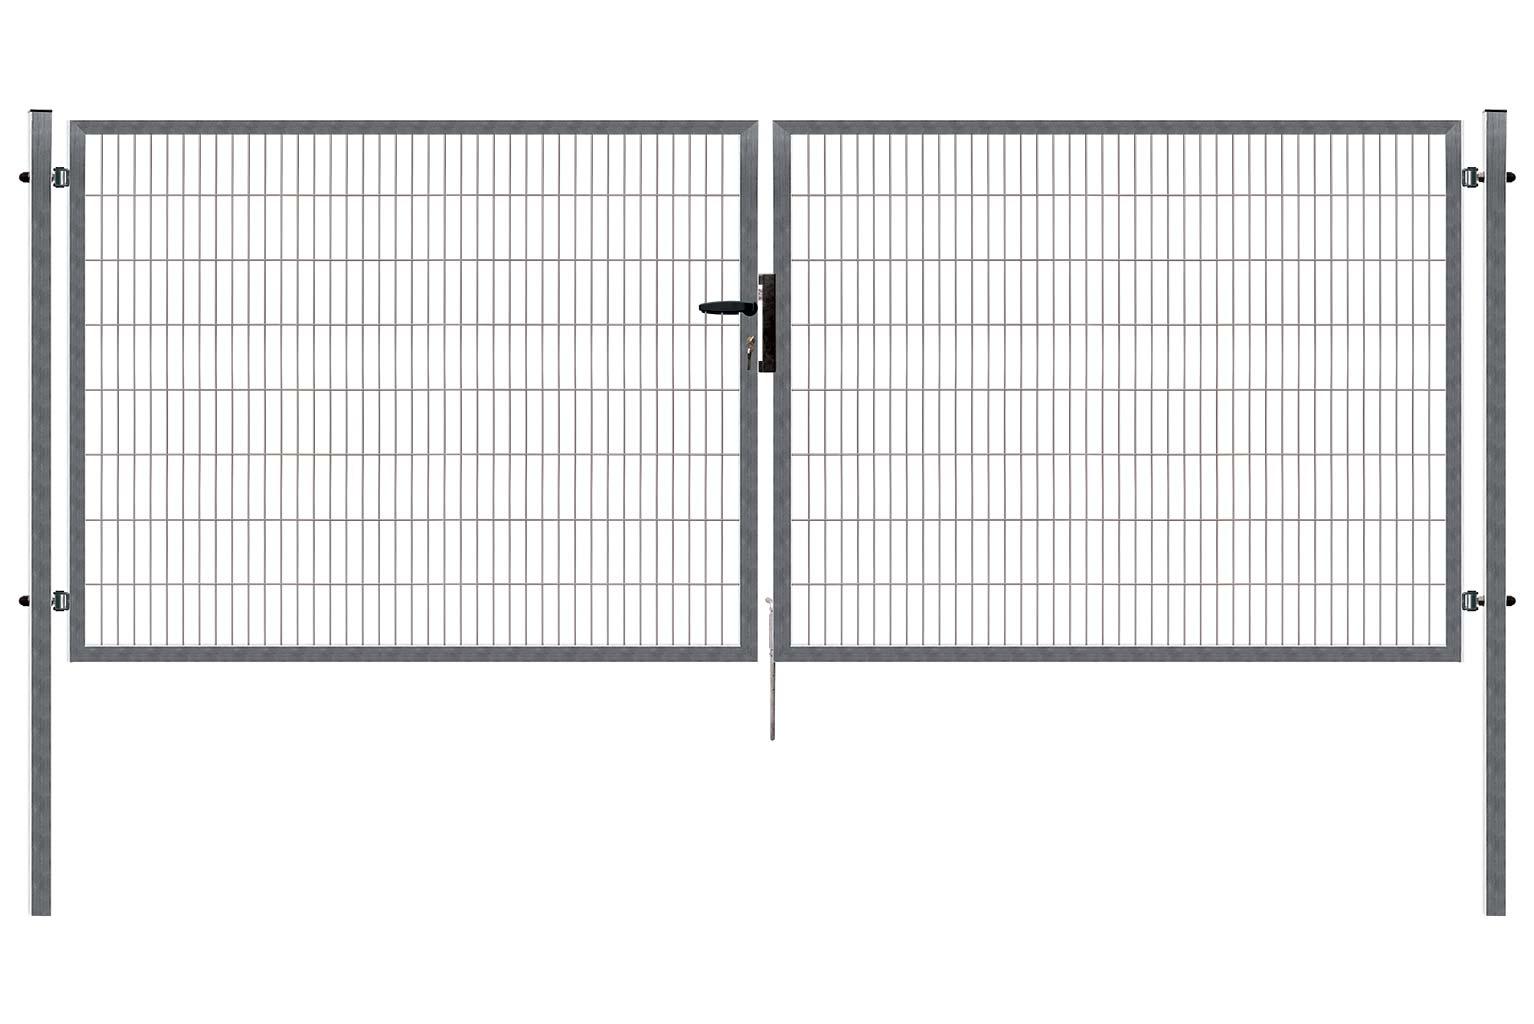 Brána PILOFOR SUPER dvoukřídlá, 4090x1580 mm, Zn 66,8Kg